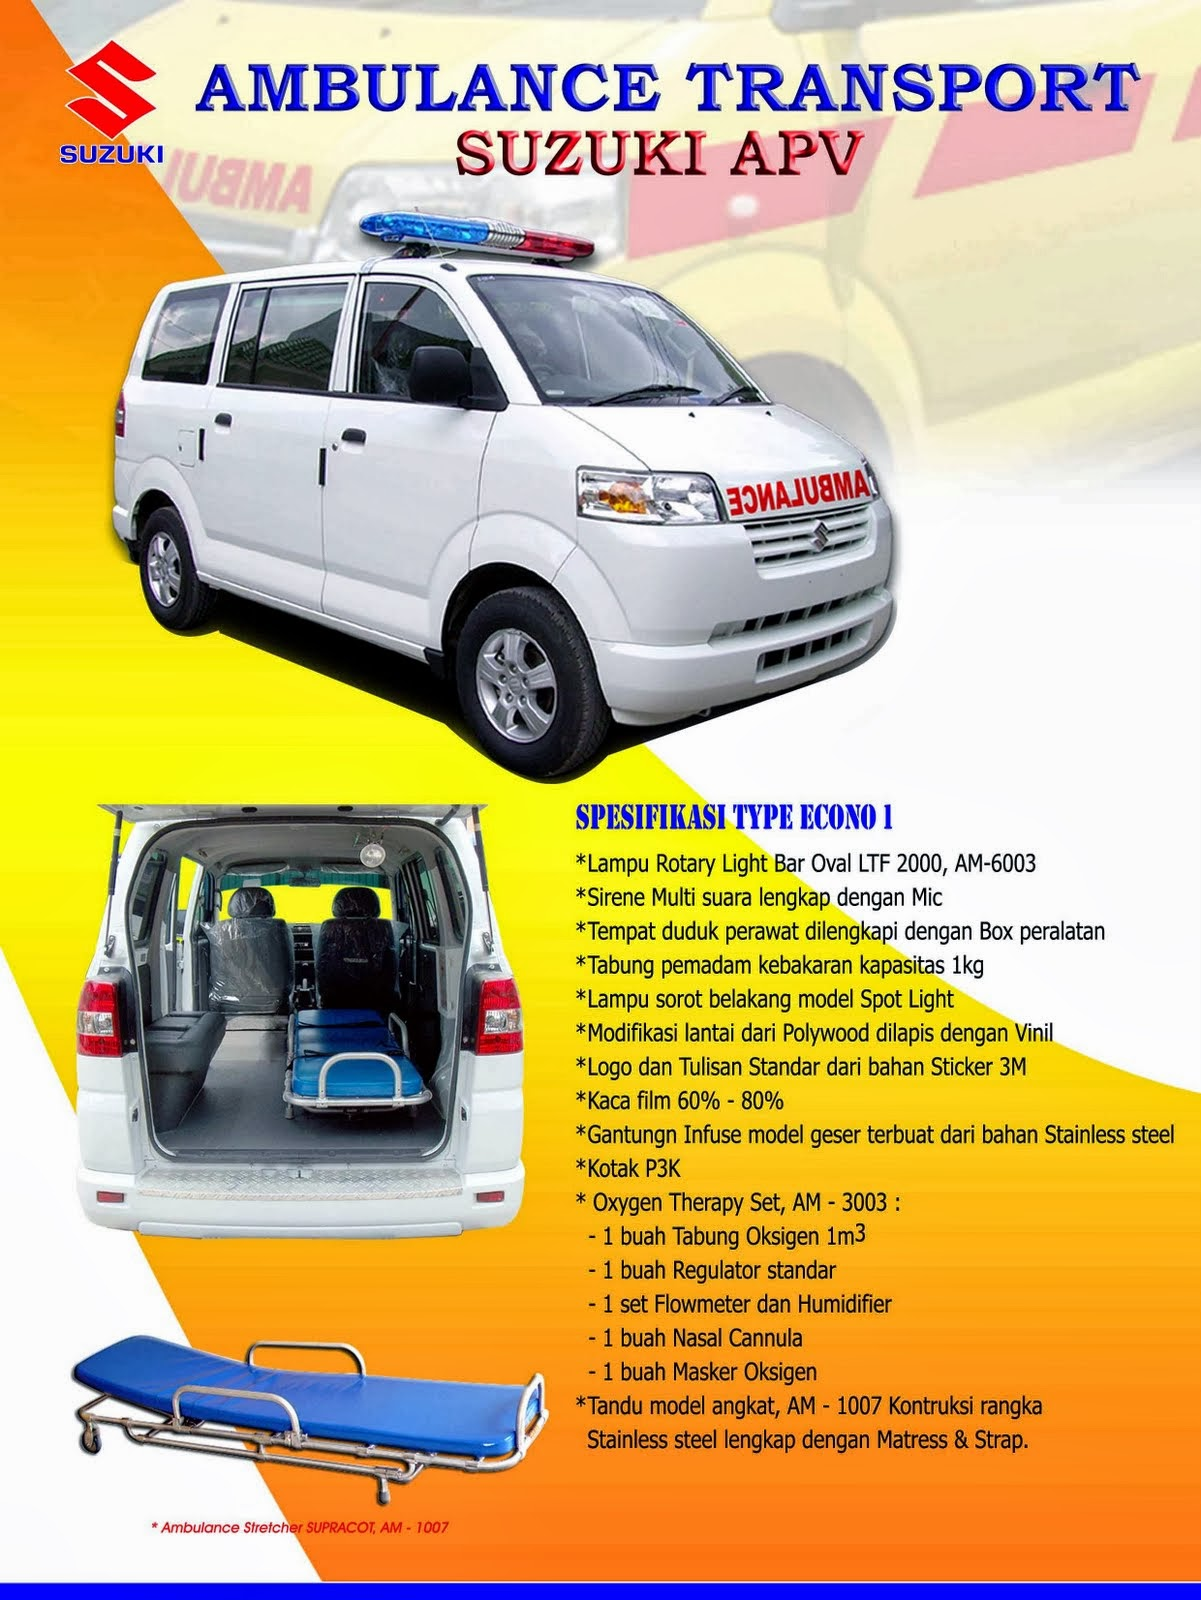 APV Ambulance Spesifikasi Economi-1 2014